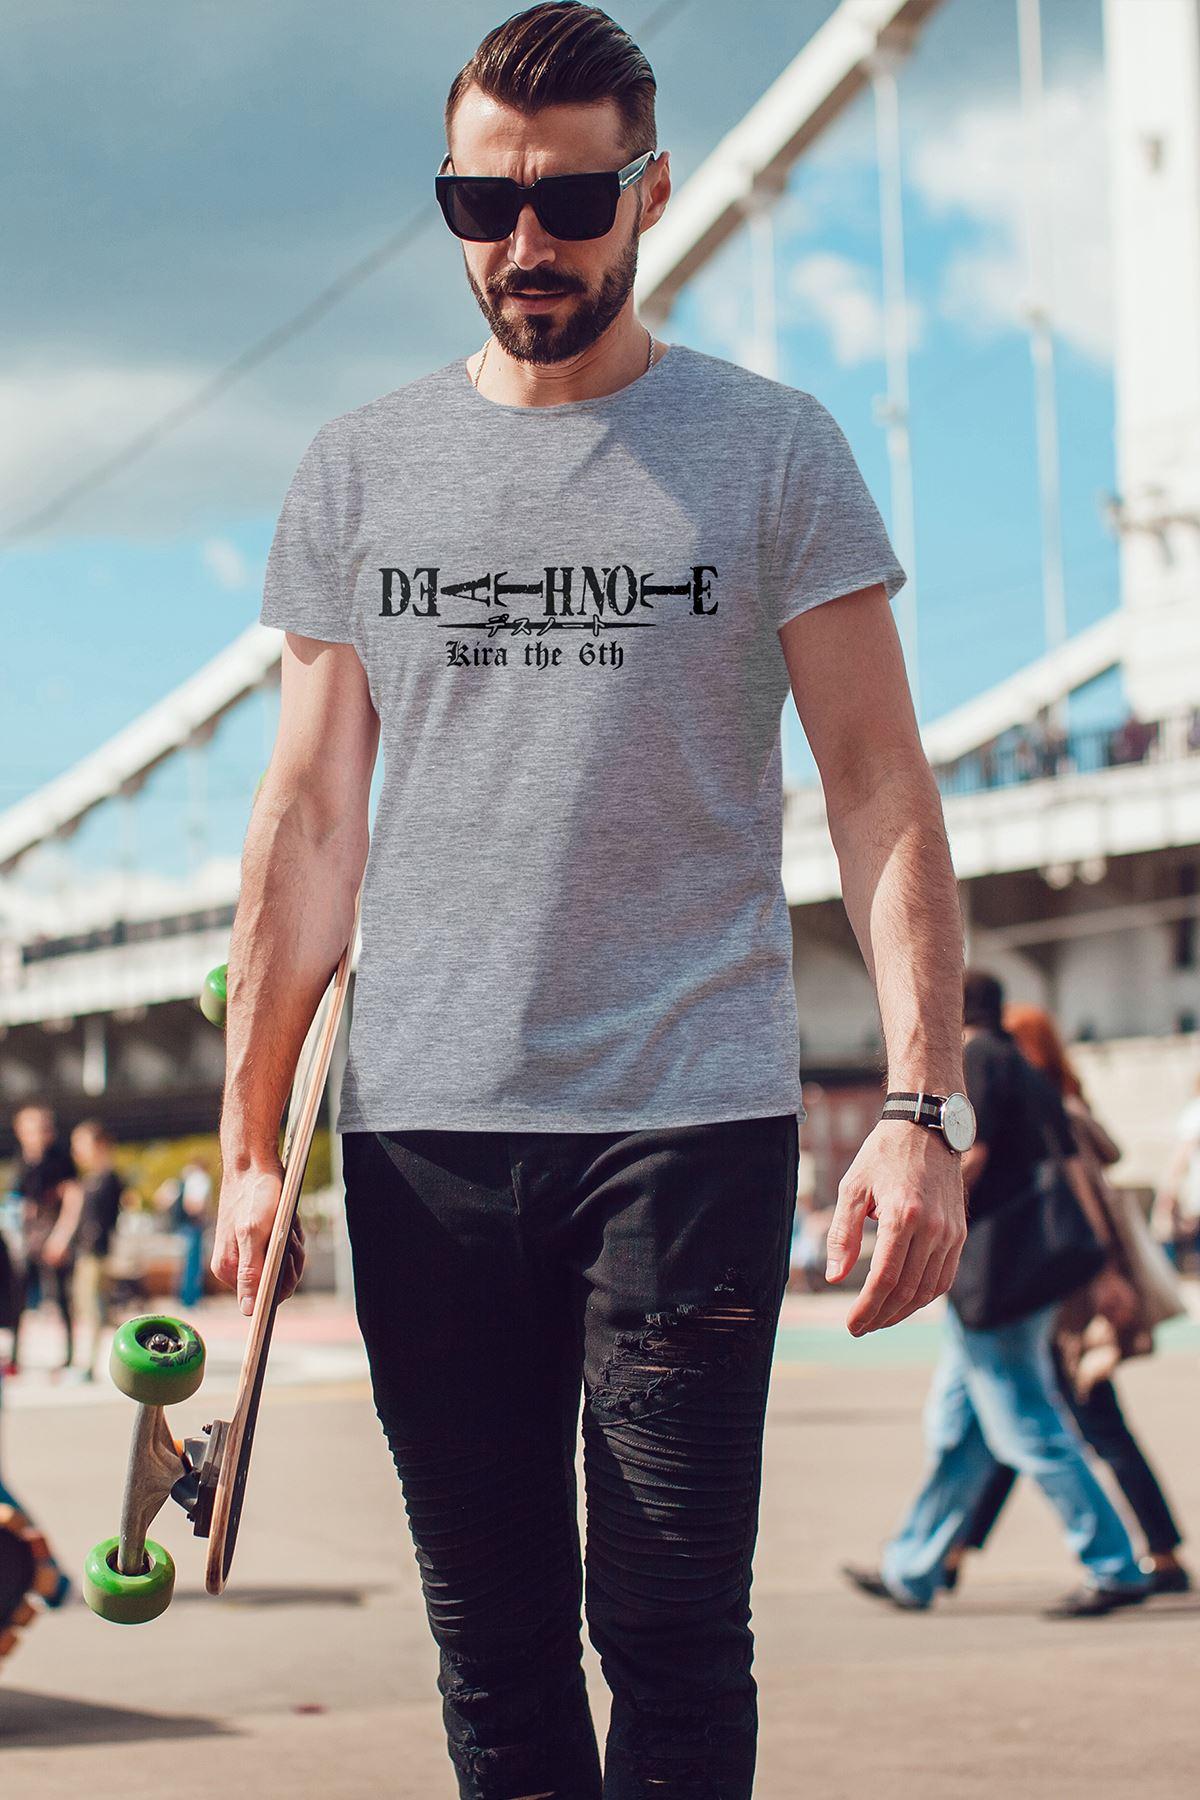 Anime Death Note Gri Erkek Tshirt - Tişört